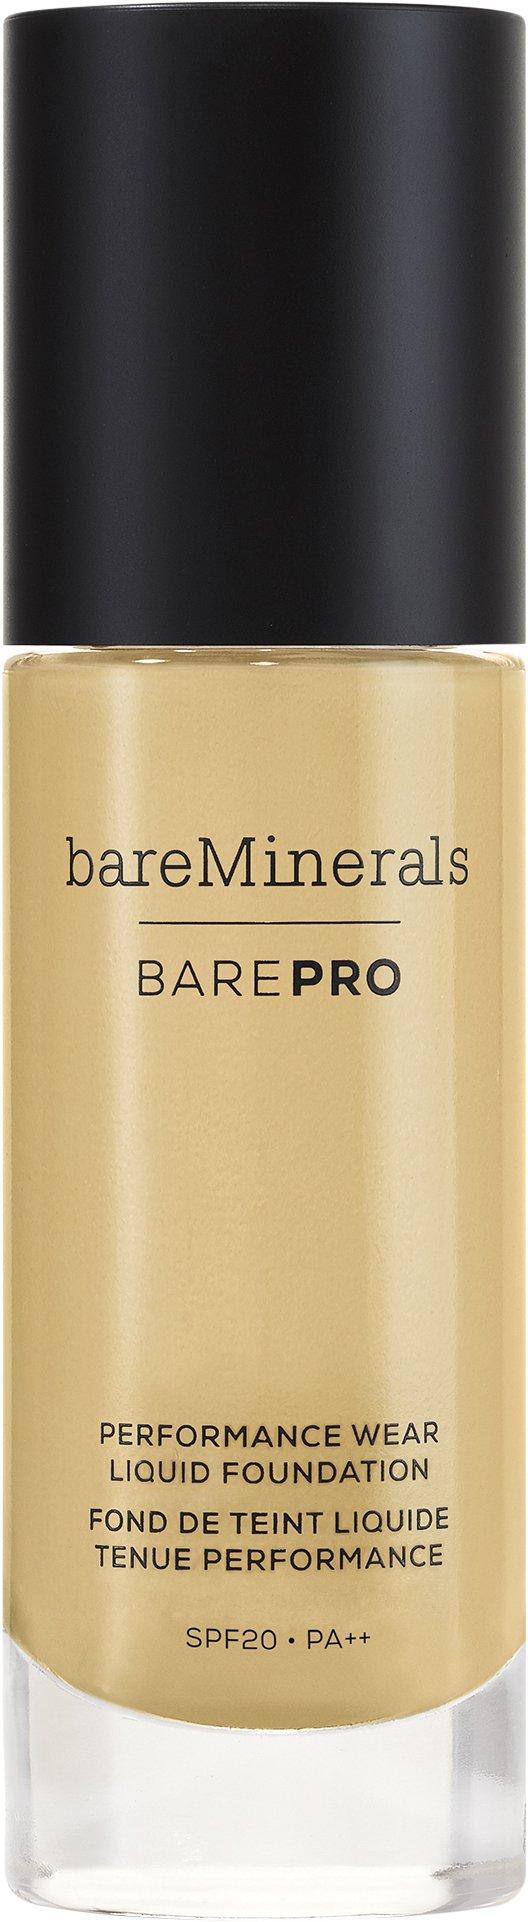 Image of   Bareminerals Foundation - Barepro Performance Wear Liquid - Champagne 03